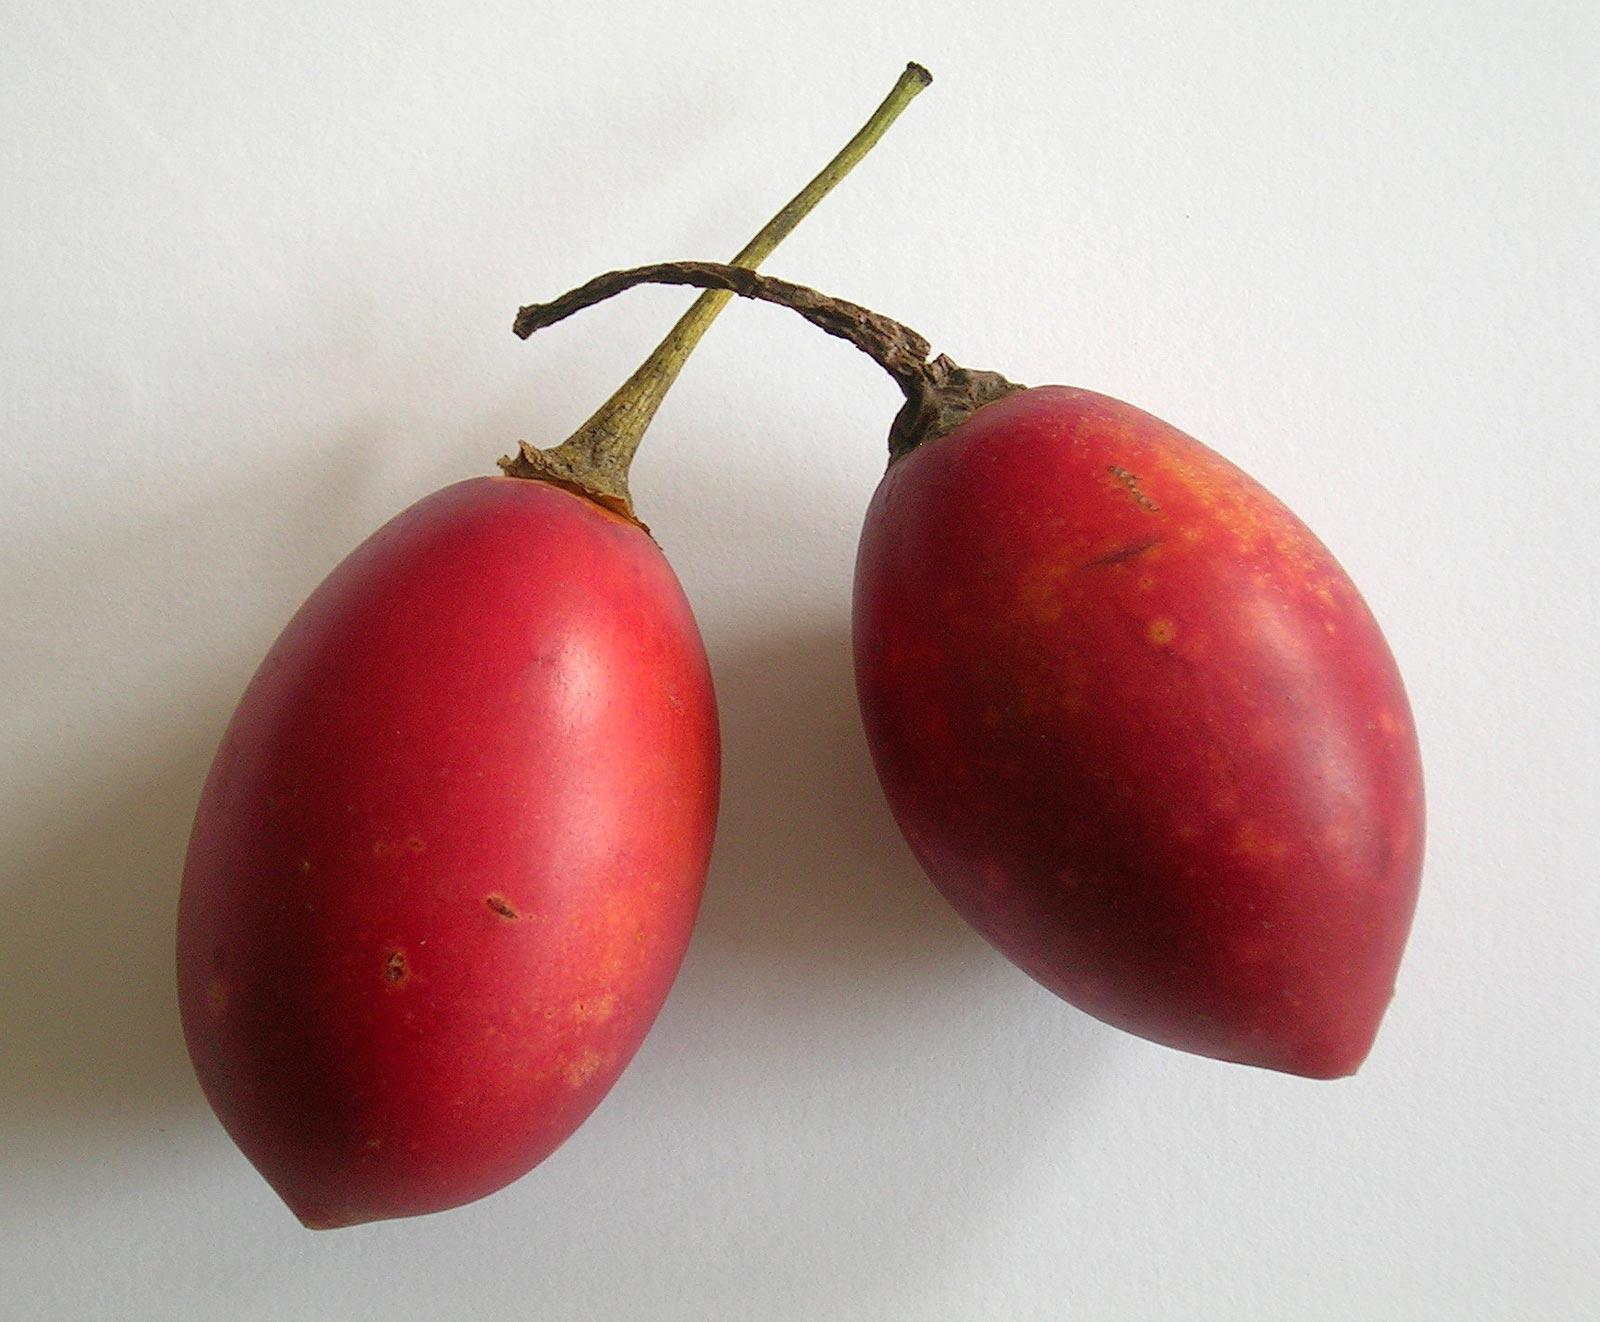 The Amazing Fruits and Veggies of Ecuador | MkMeier's Blog